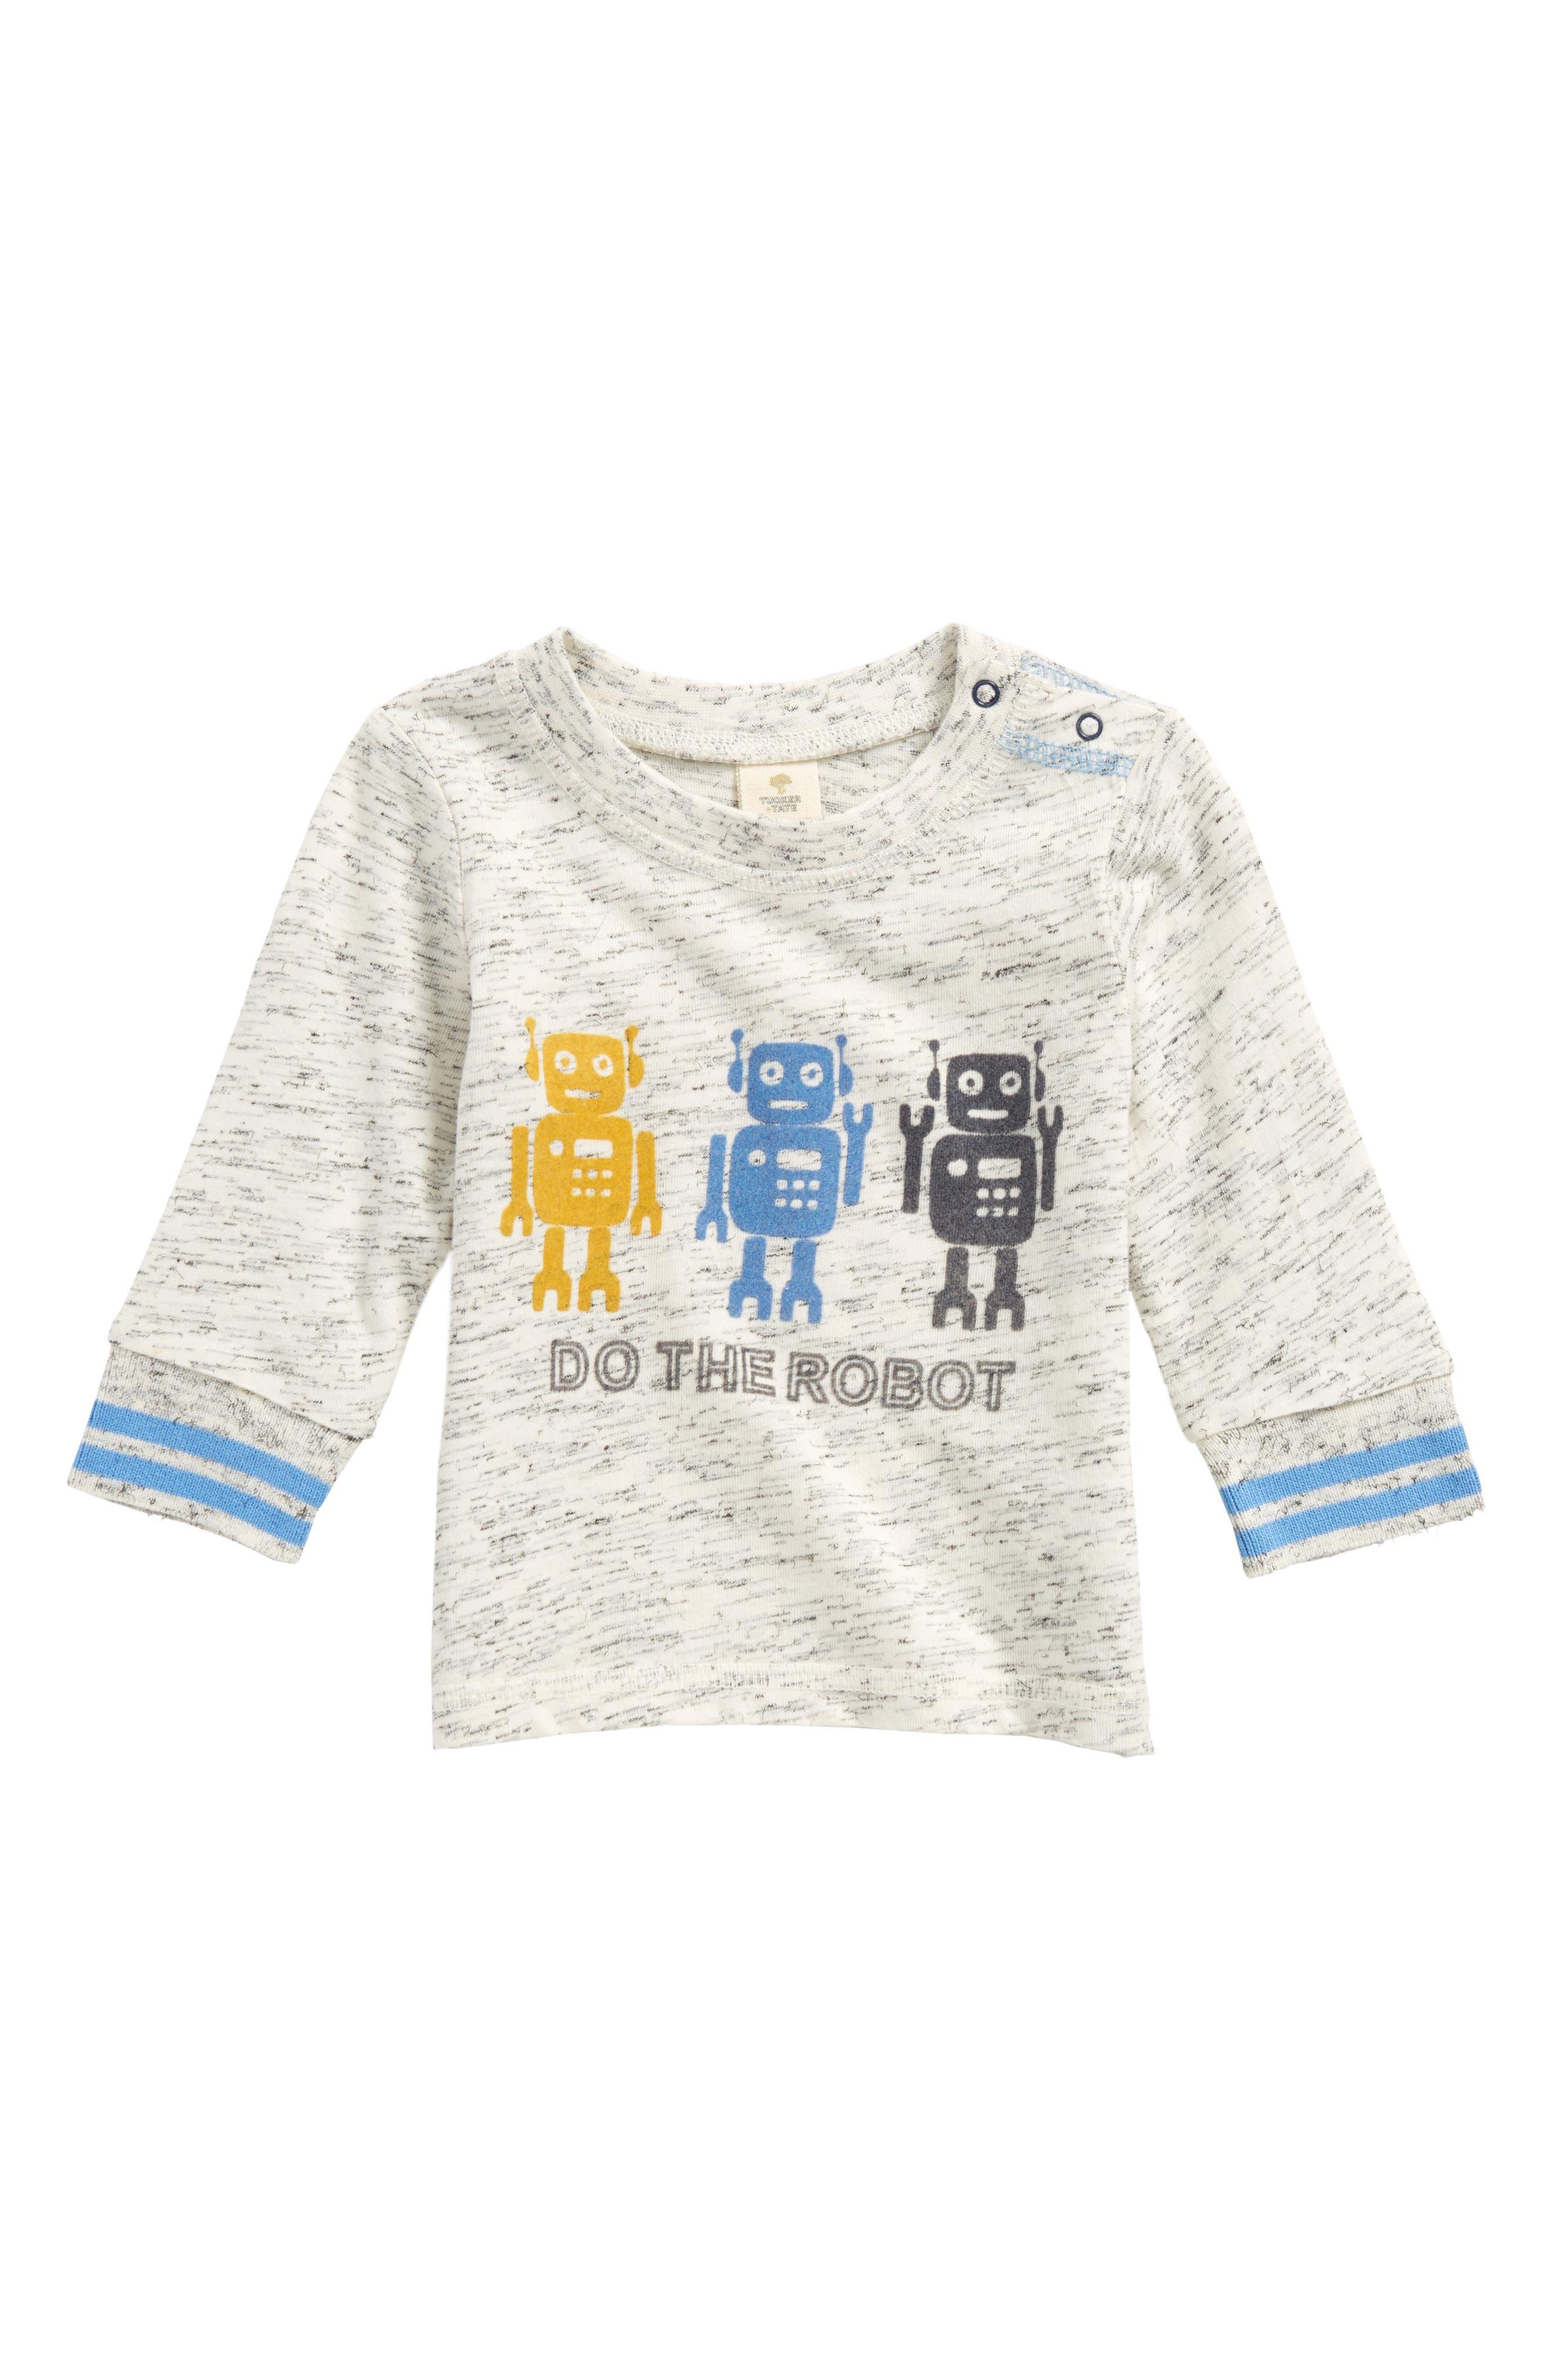 Alternate Image 1 Selected - Tucker + Tate Robot T-Shirt (Baby Boys)